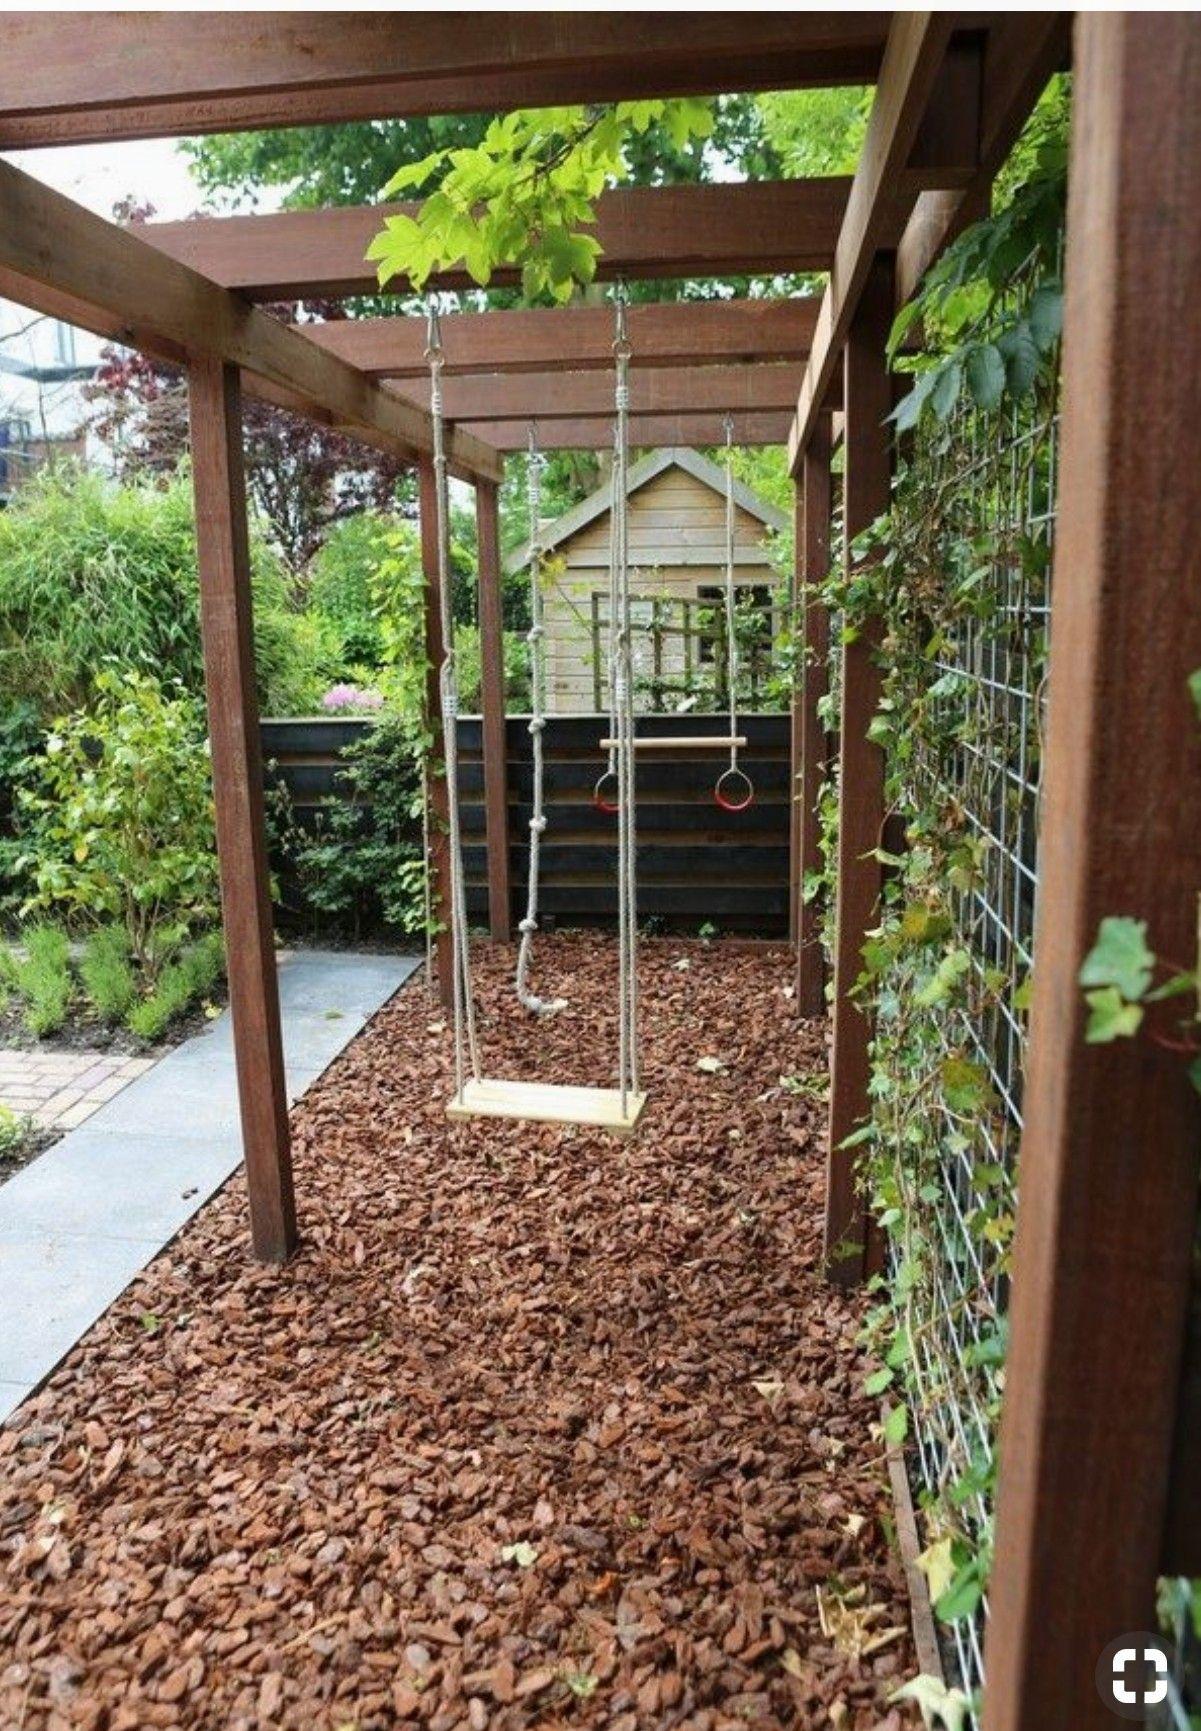 Pin by Tom Wayne on Backyard Retreat | Pinterest | Backyard, Yards ...